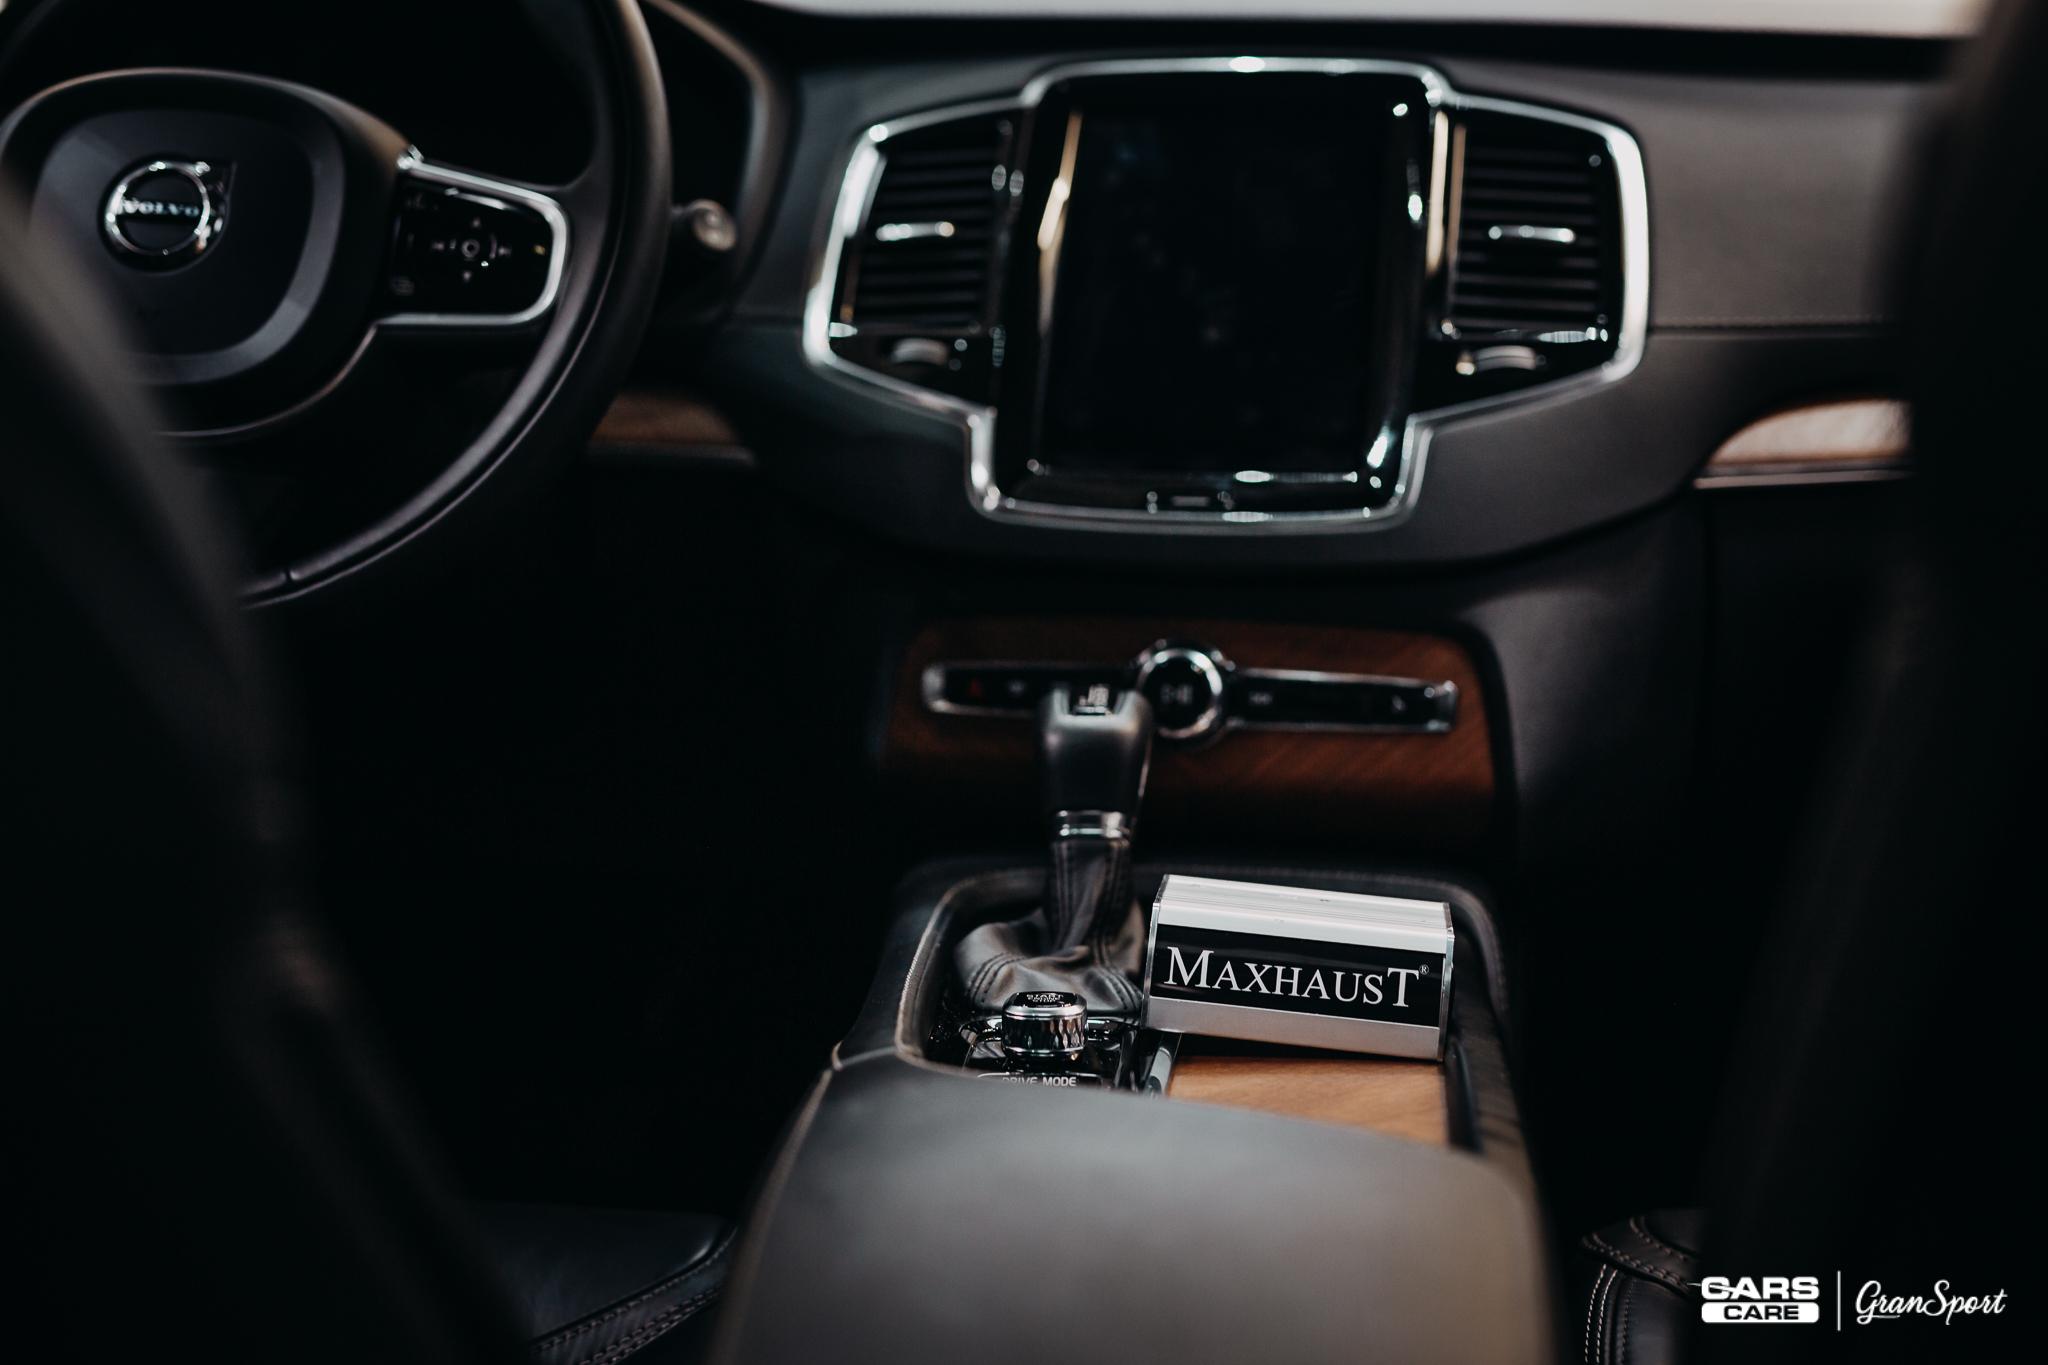 Volvo XC90 Maxhaust